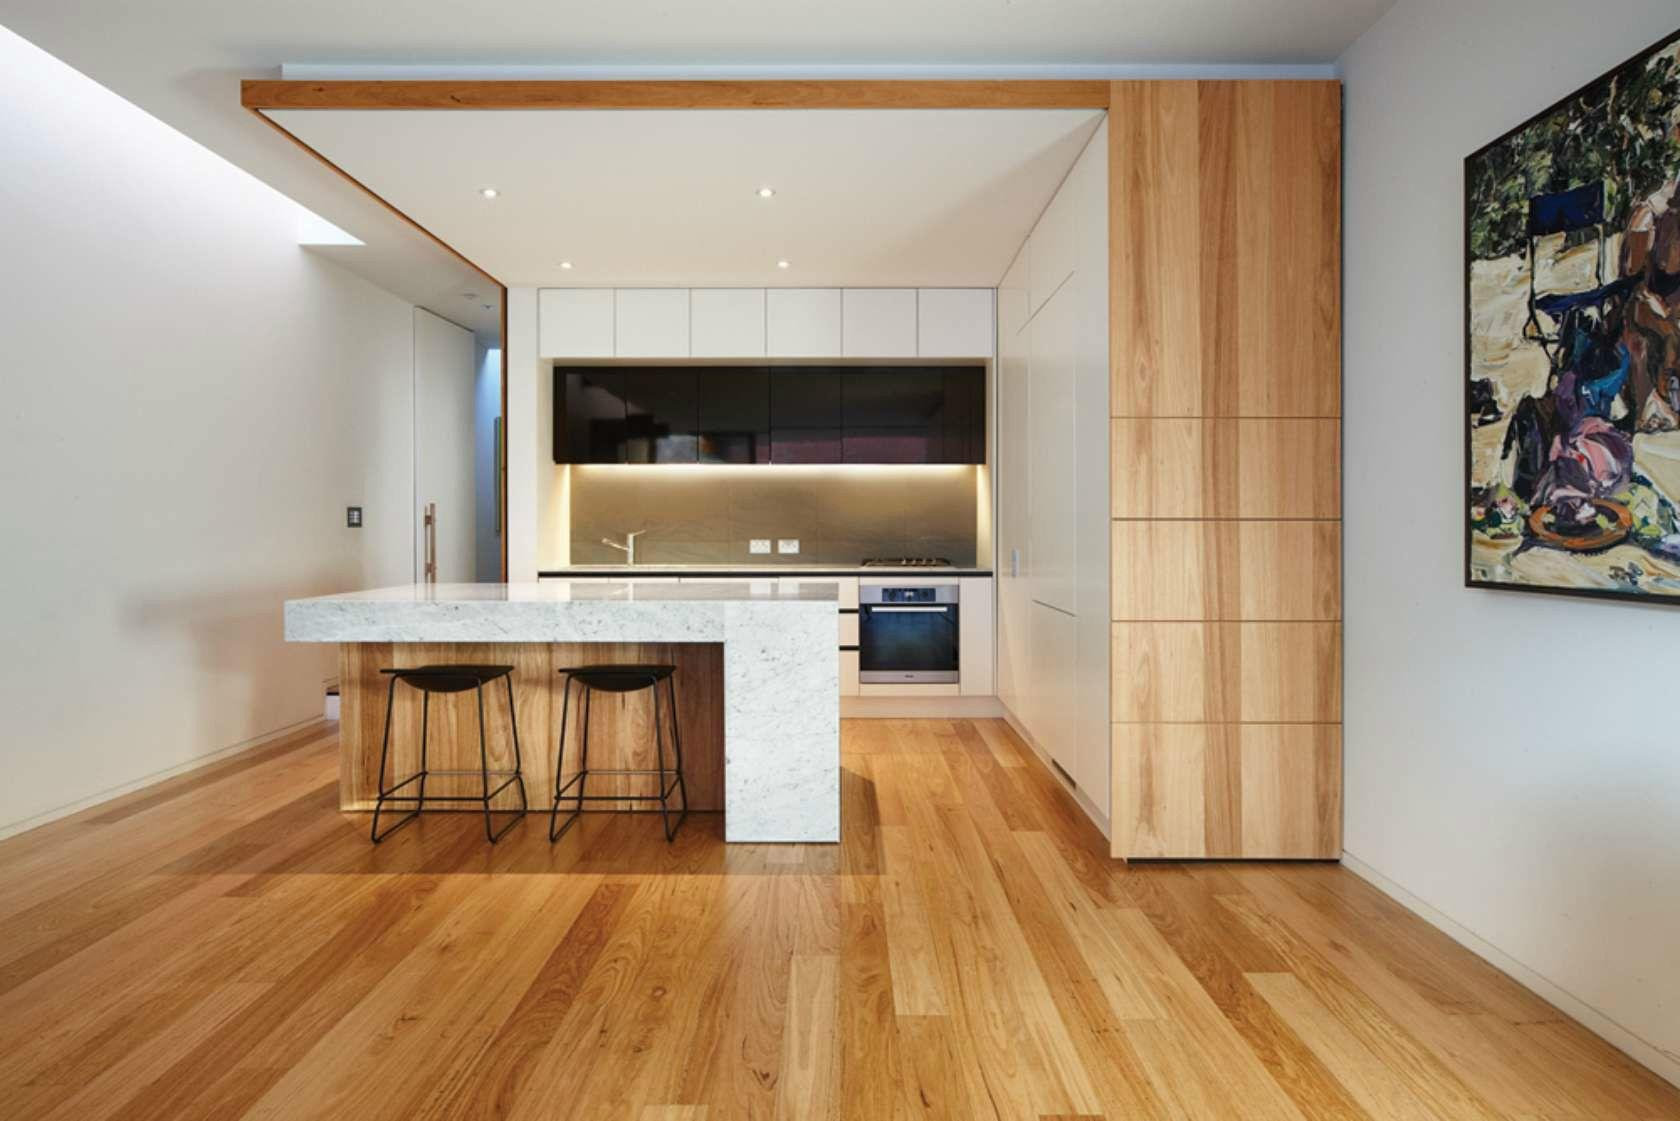 arch2o-treetop-house-melbourne-matt-gibson-architecture-design-02 ...